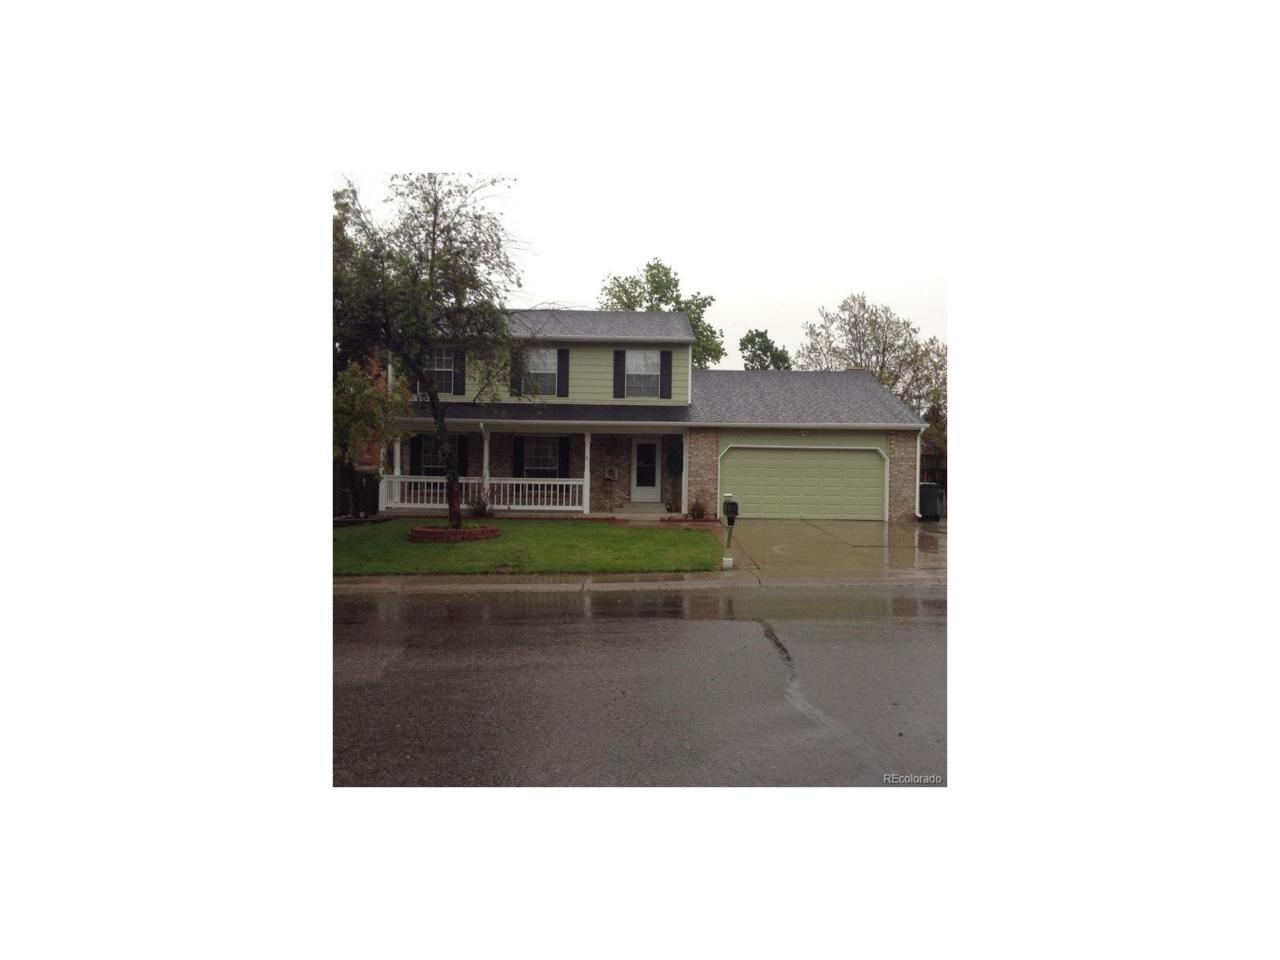 1482 S Yampa Way, Aurora, CO 80017 (MLS #3932566) :: 8z Real Estate